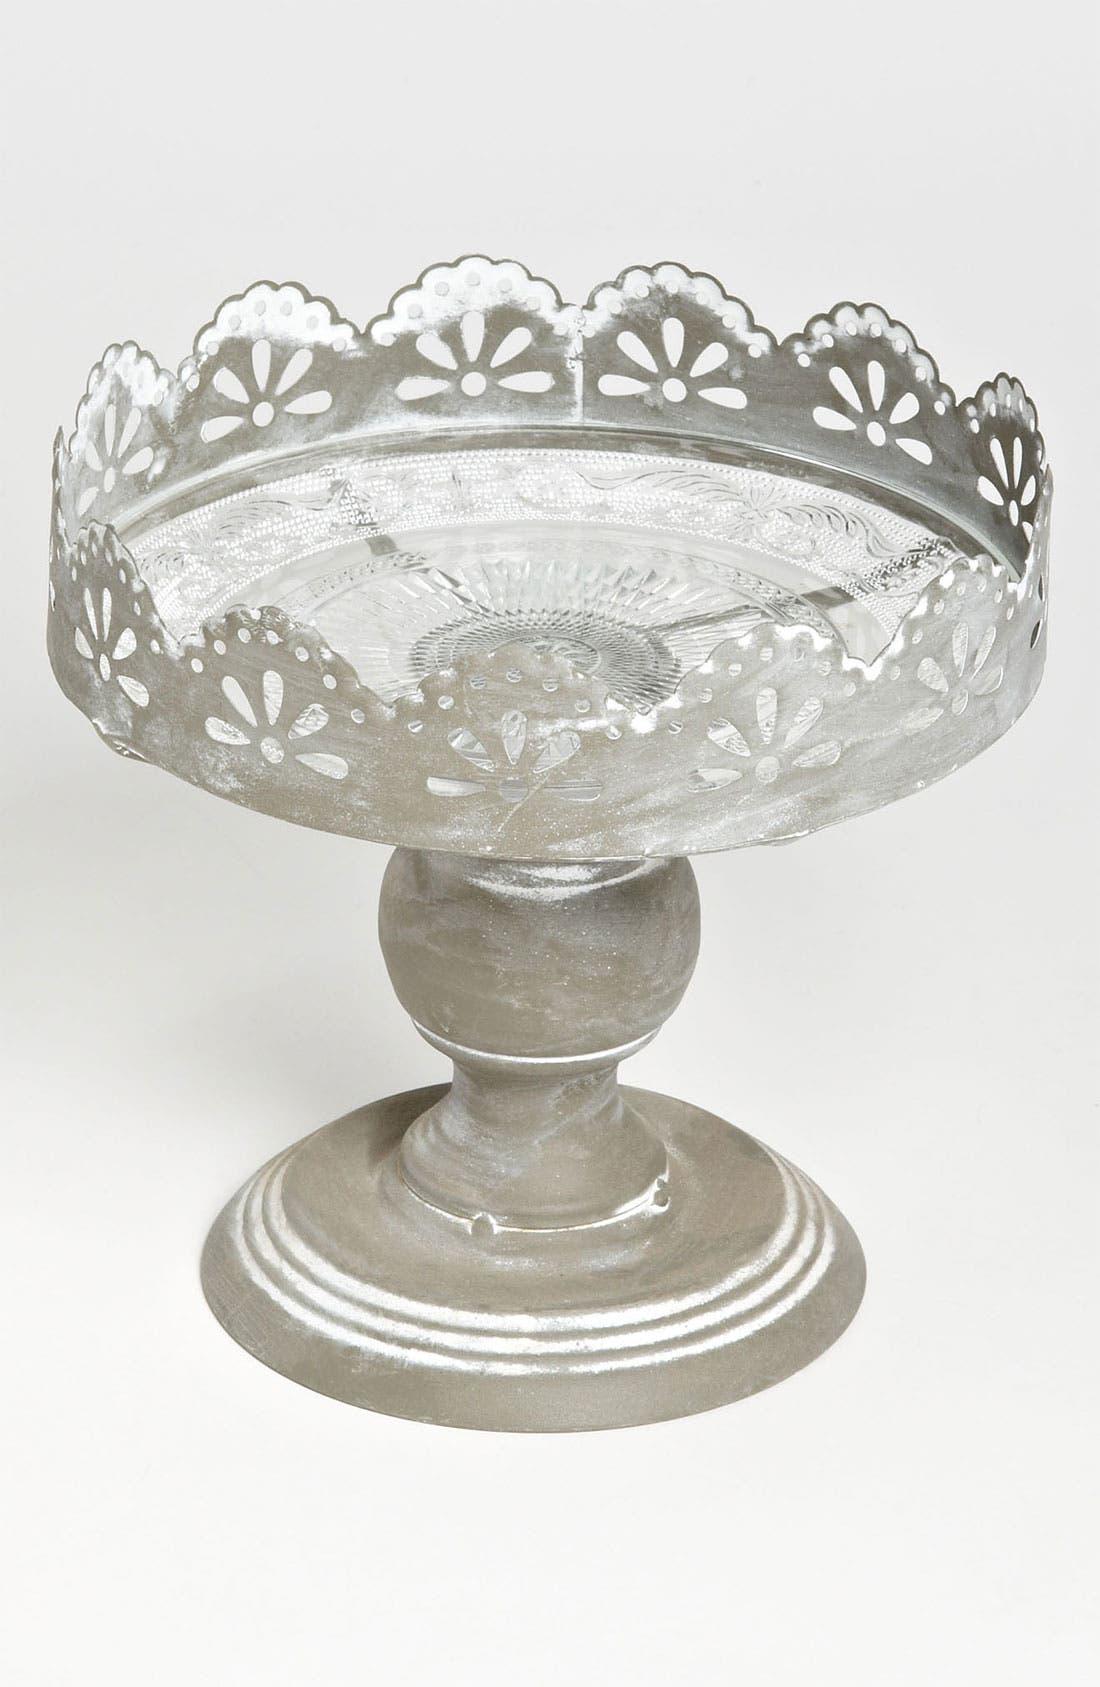 Main Image - Metal & Glass Pedestal Plate, Small